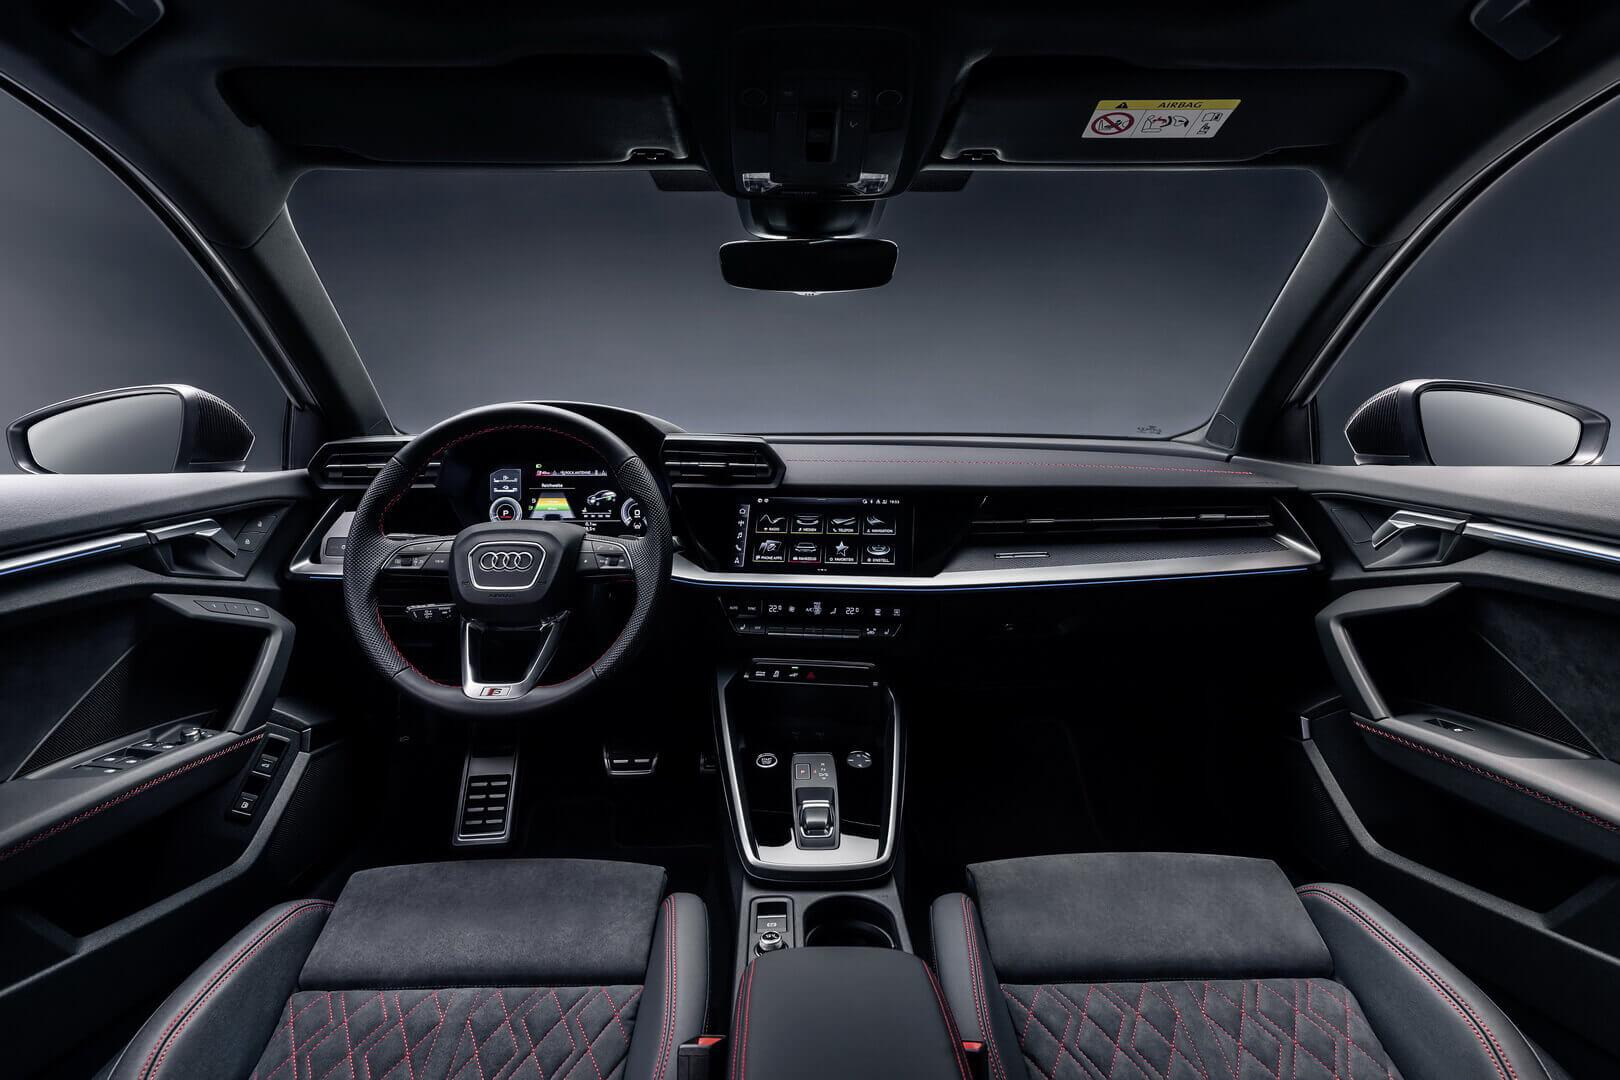 Интерьер плагин-гибрида Audi A3 Sportback 45 TFSI e